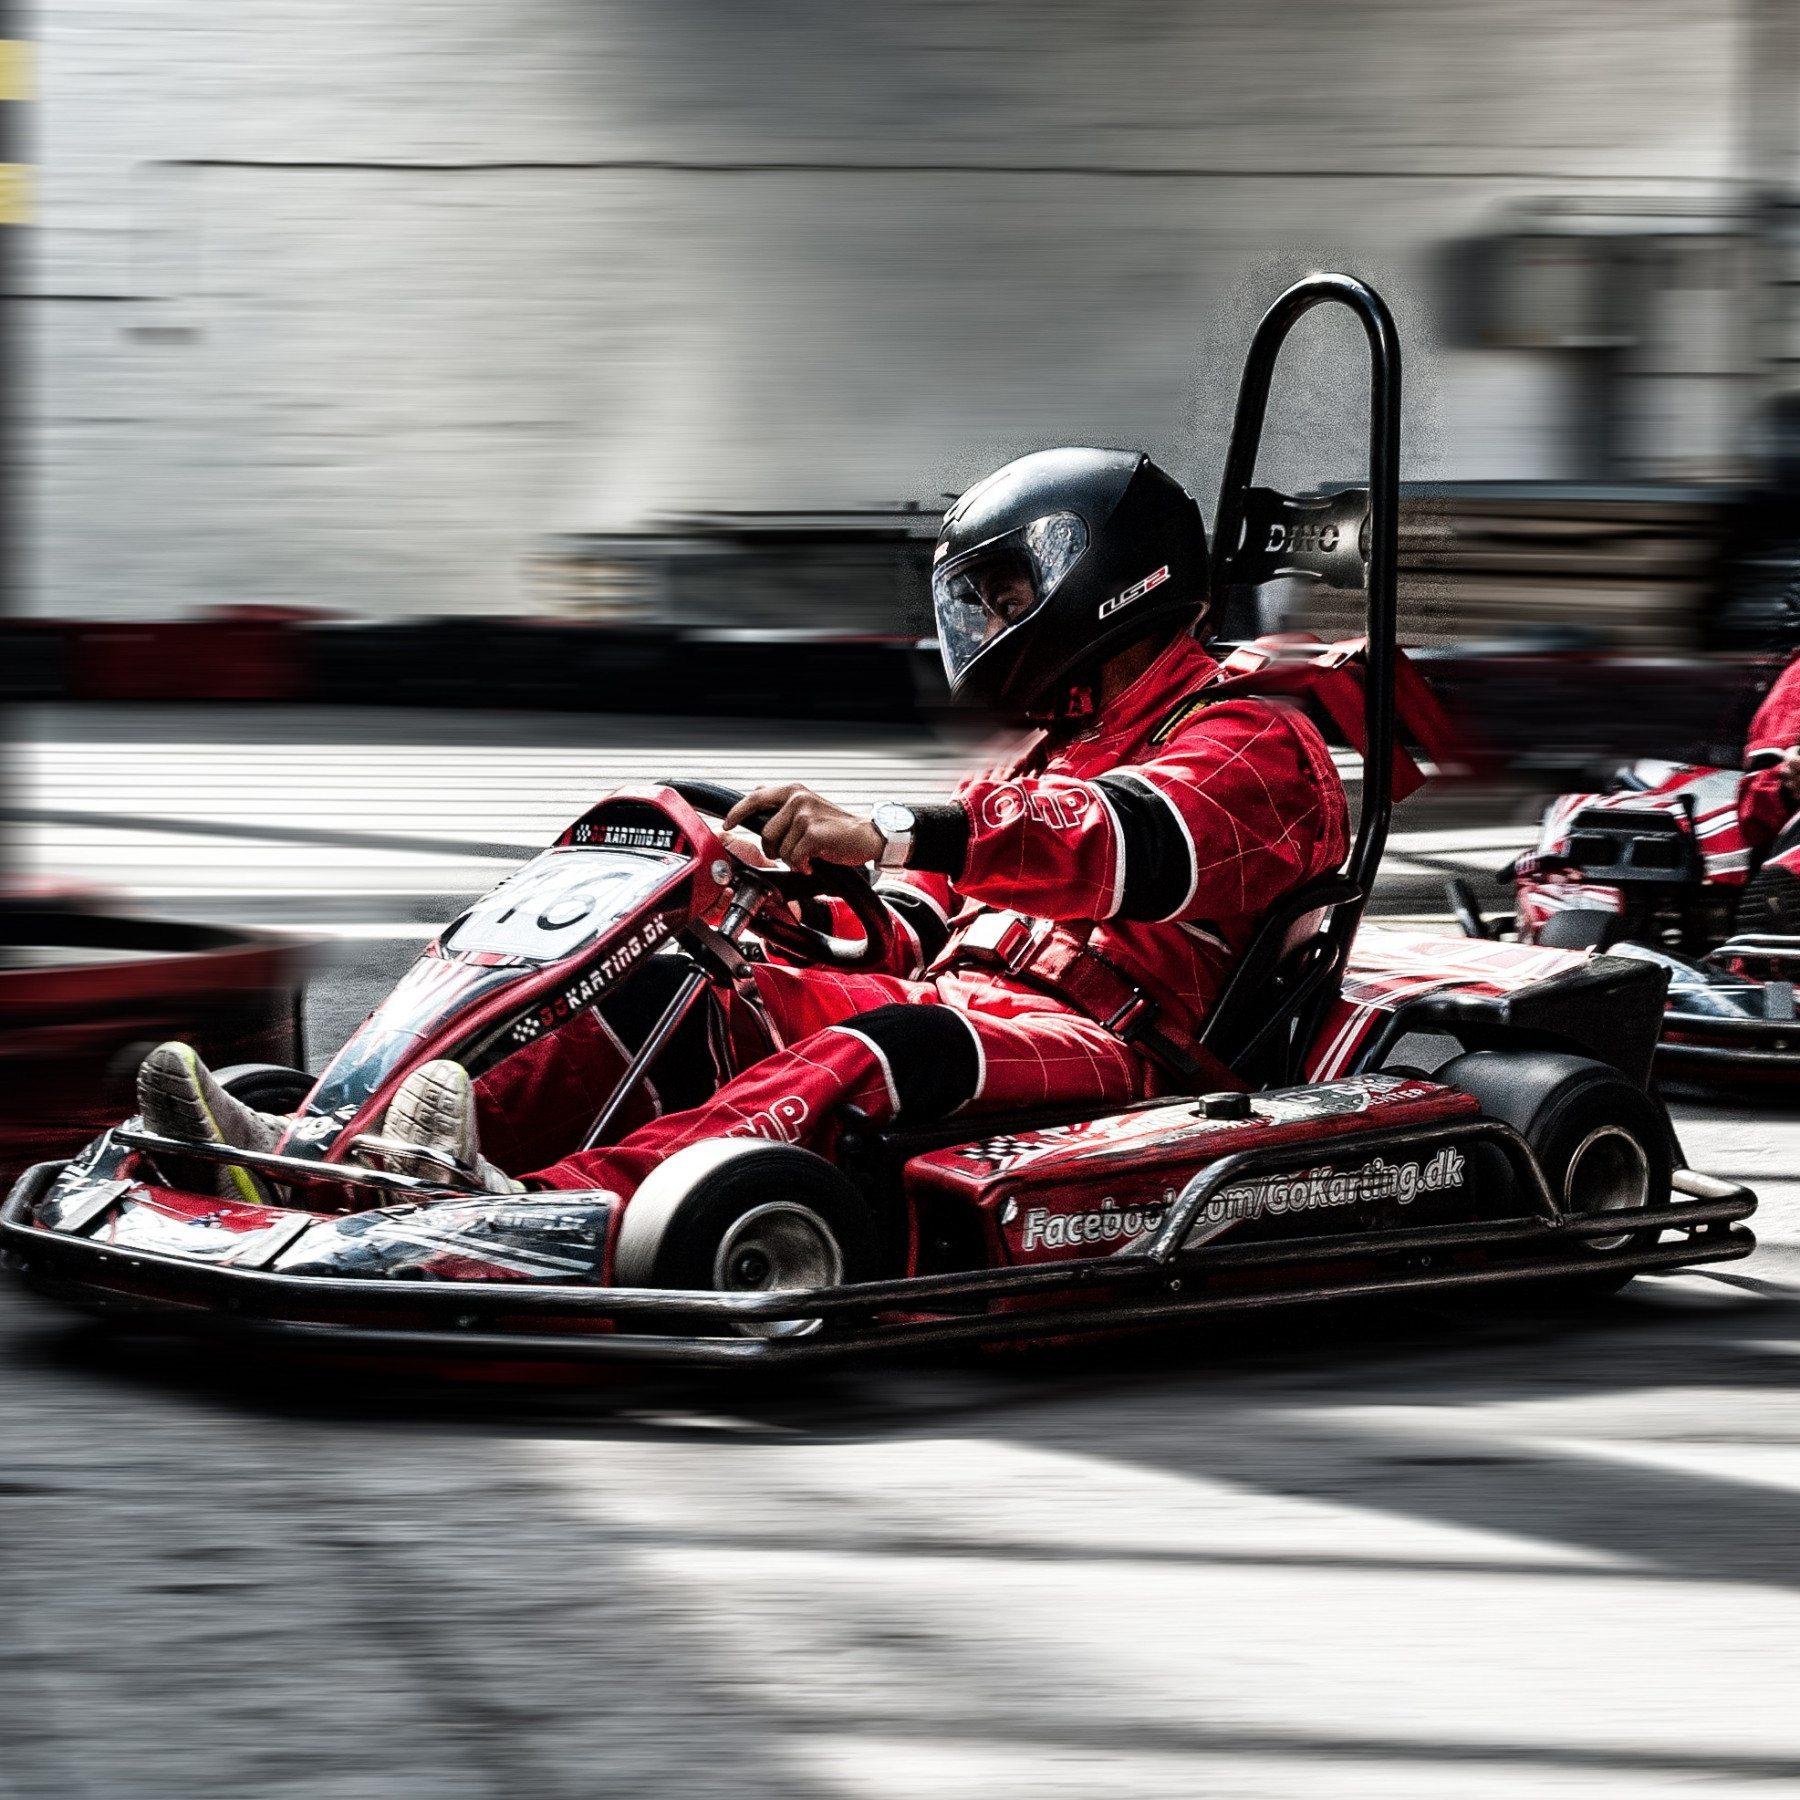 F1 Gokart Grand Prix - Brøndby